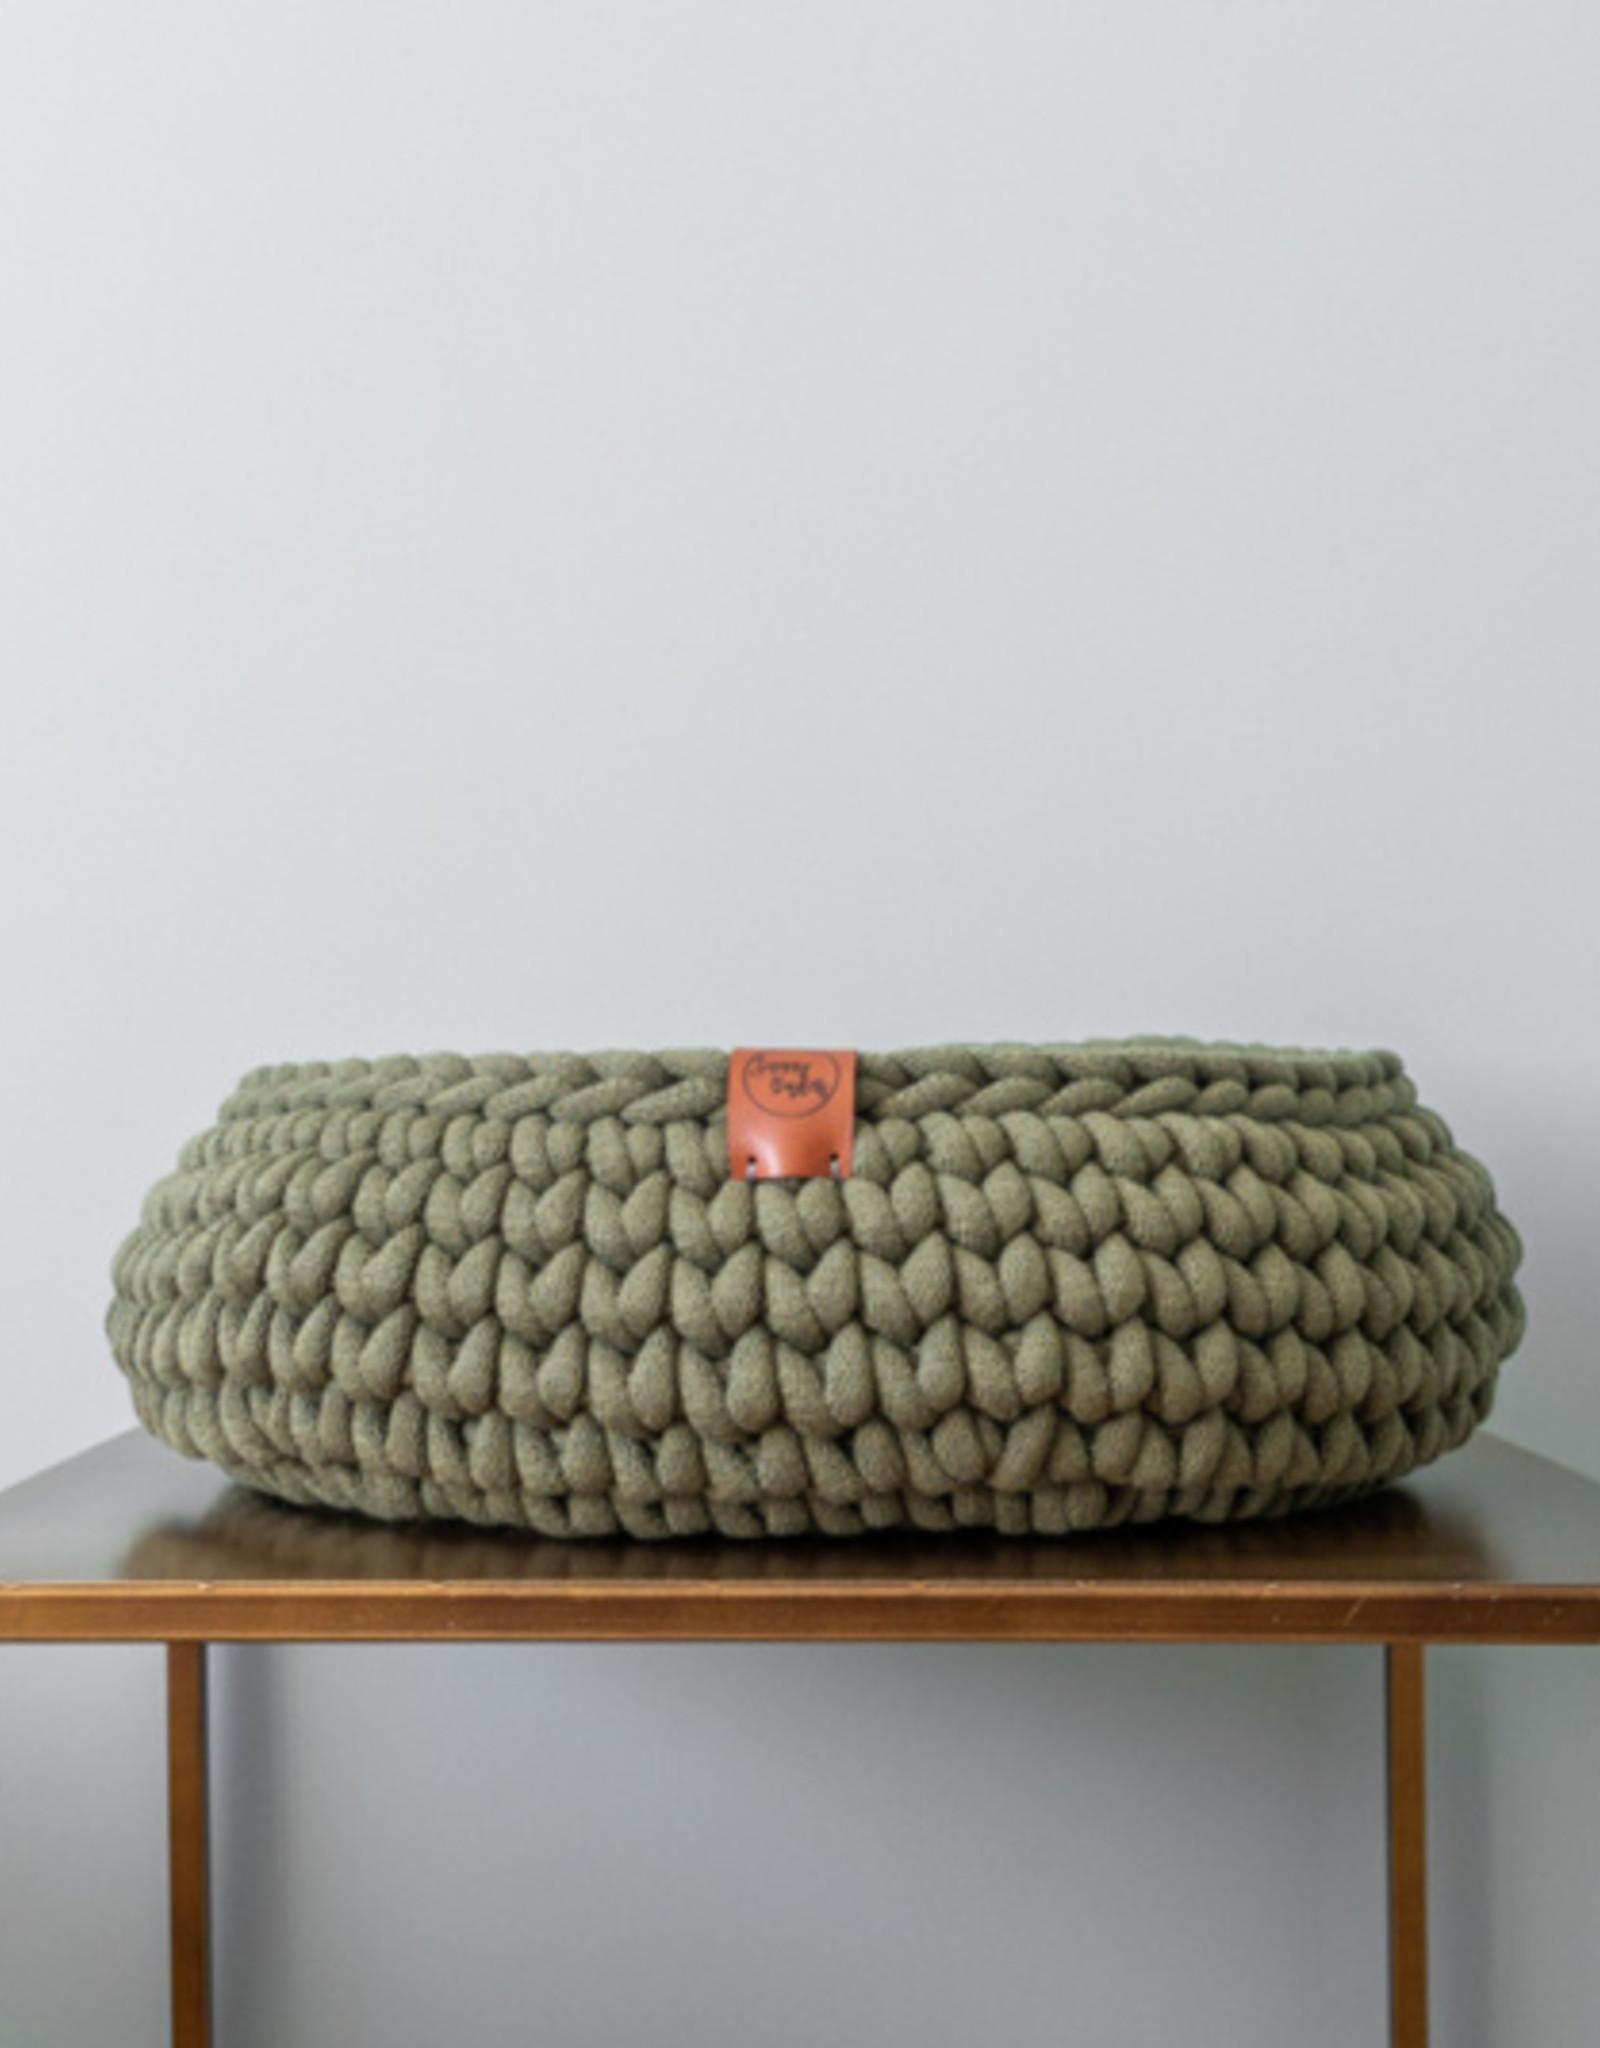 Sunny Baskets Sunny Baskets - Handgehaakte kattenmand - avocado groen M